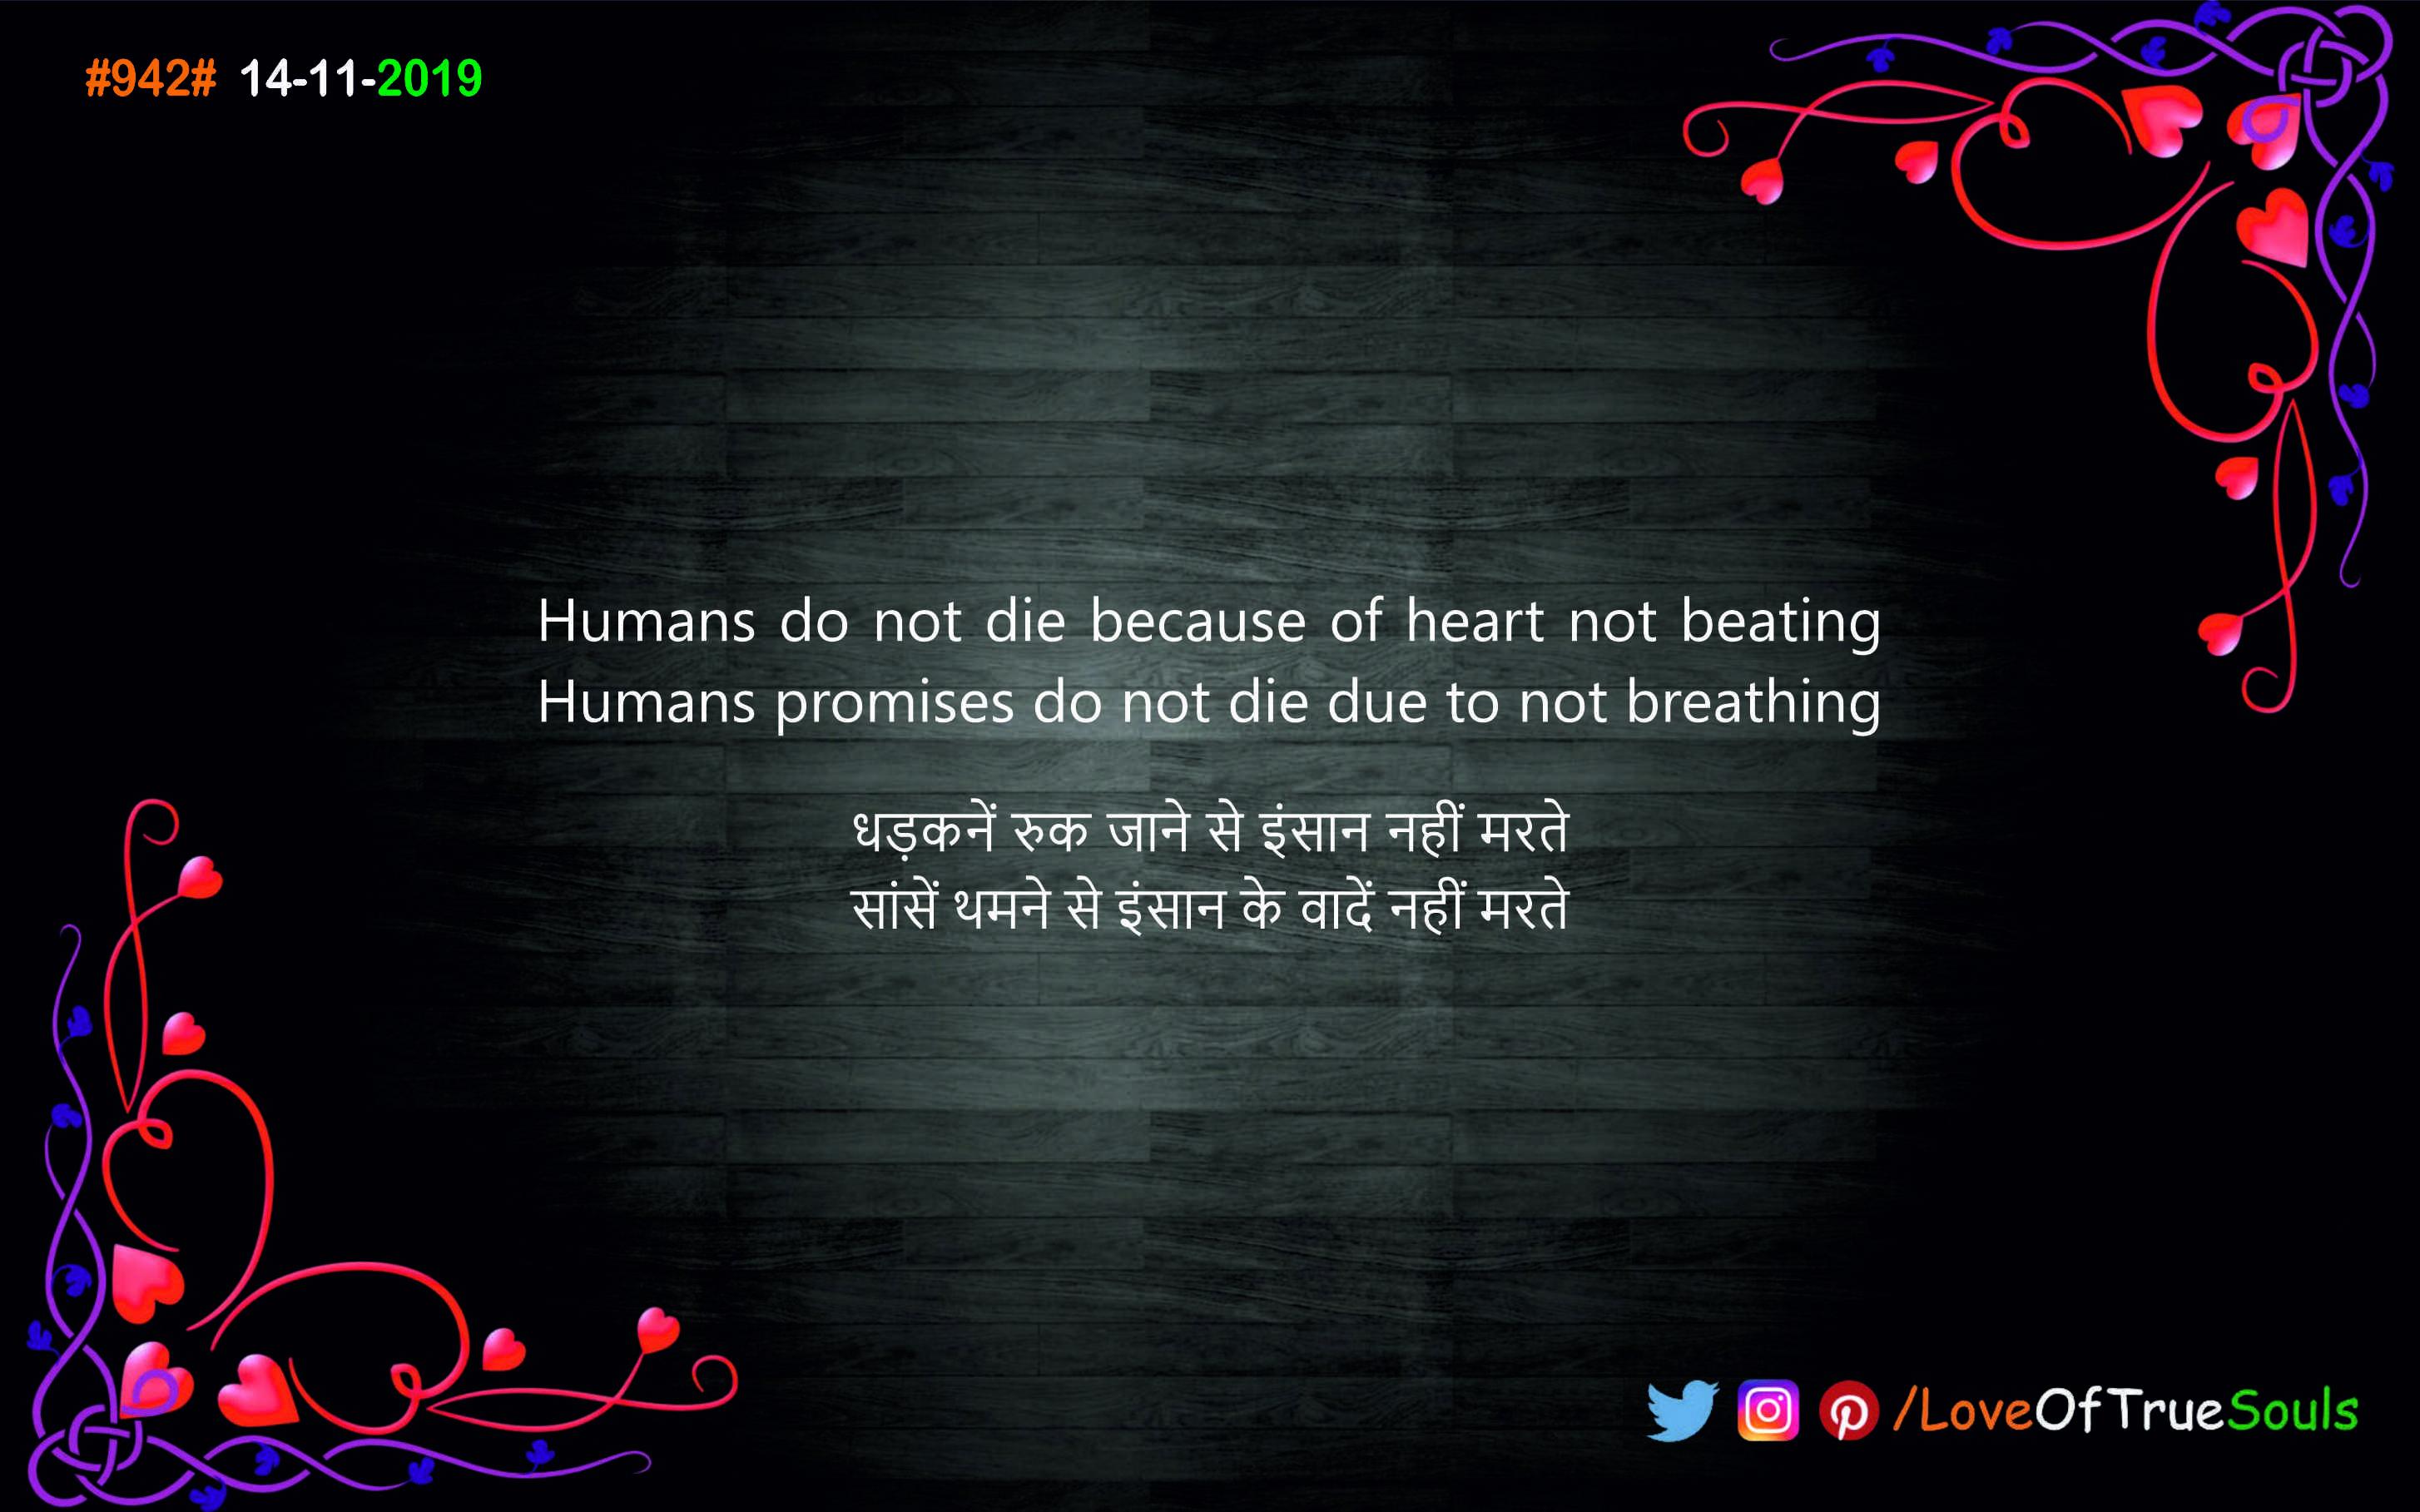 14112019 धडकन रक जन स इसन नह मरत सस थमन स इसन क वद नह मरत Humans do not die because of heart not beating Humans promises do not die due to not breathing